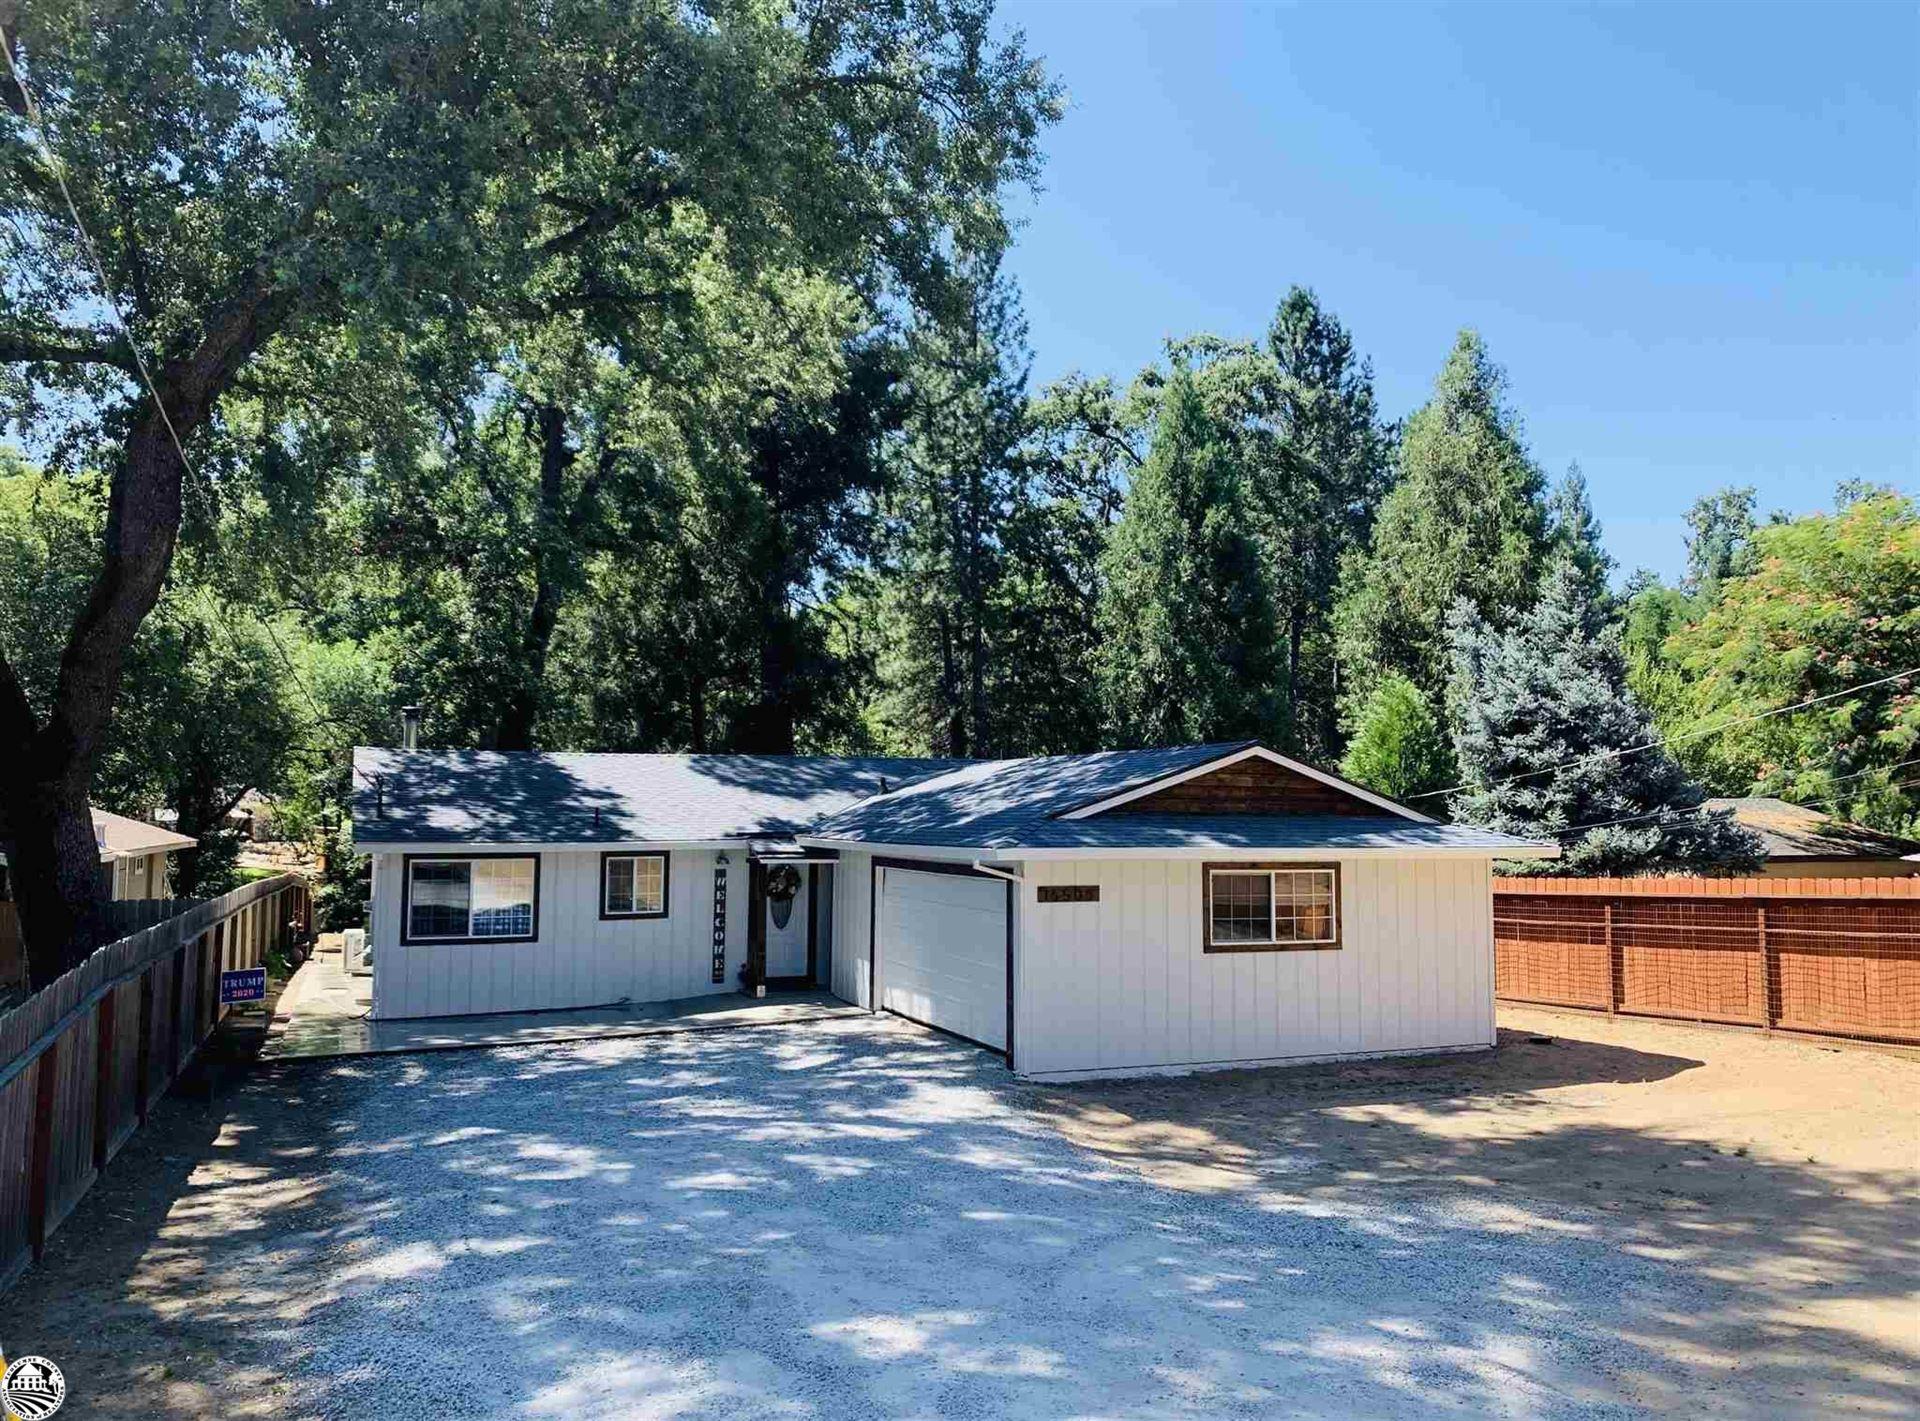 16505 Creekside Dr Drive Drive, Sonora, CA 95370 - MLS#: 20201235